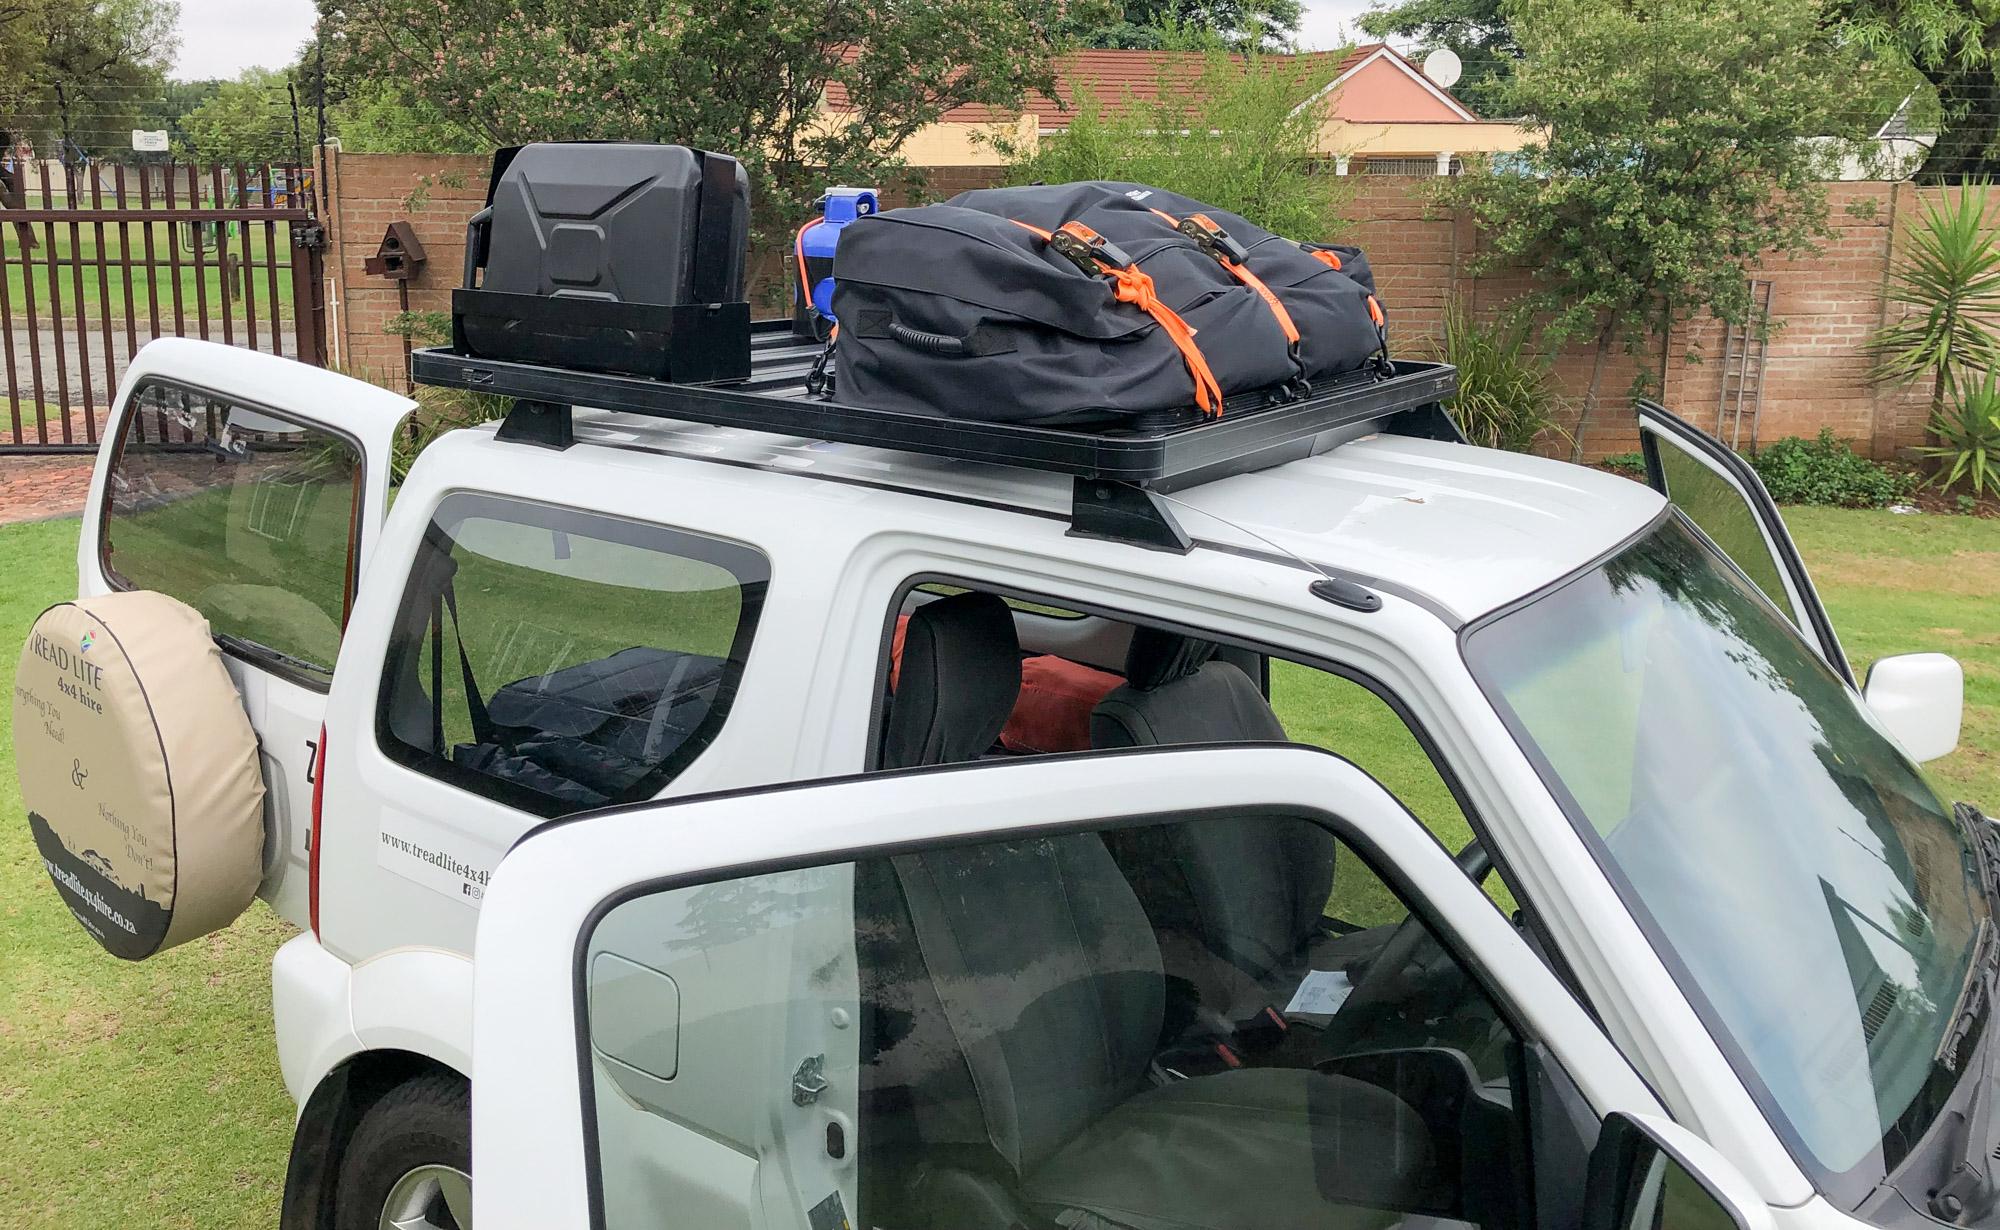 Johannesburg to Cape Town in a Suzuki Jimny